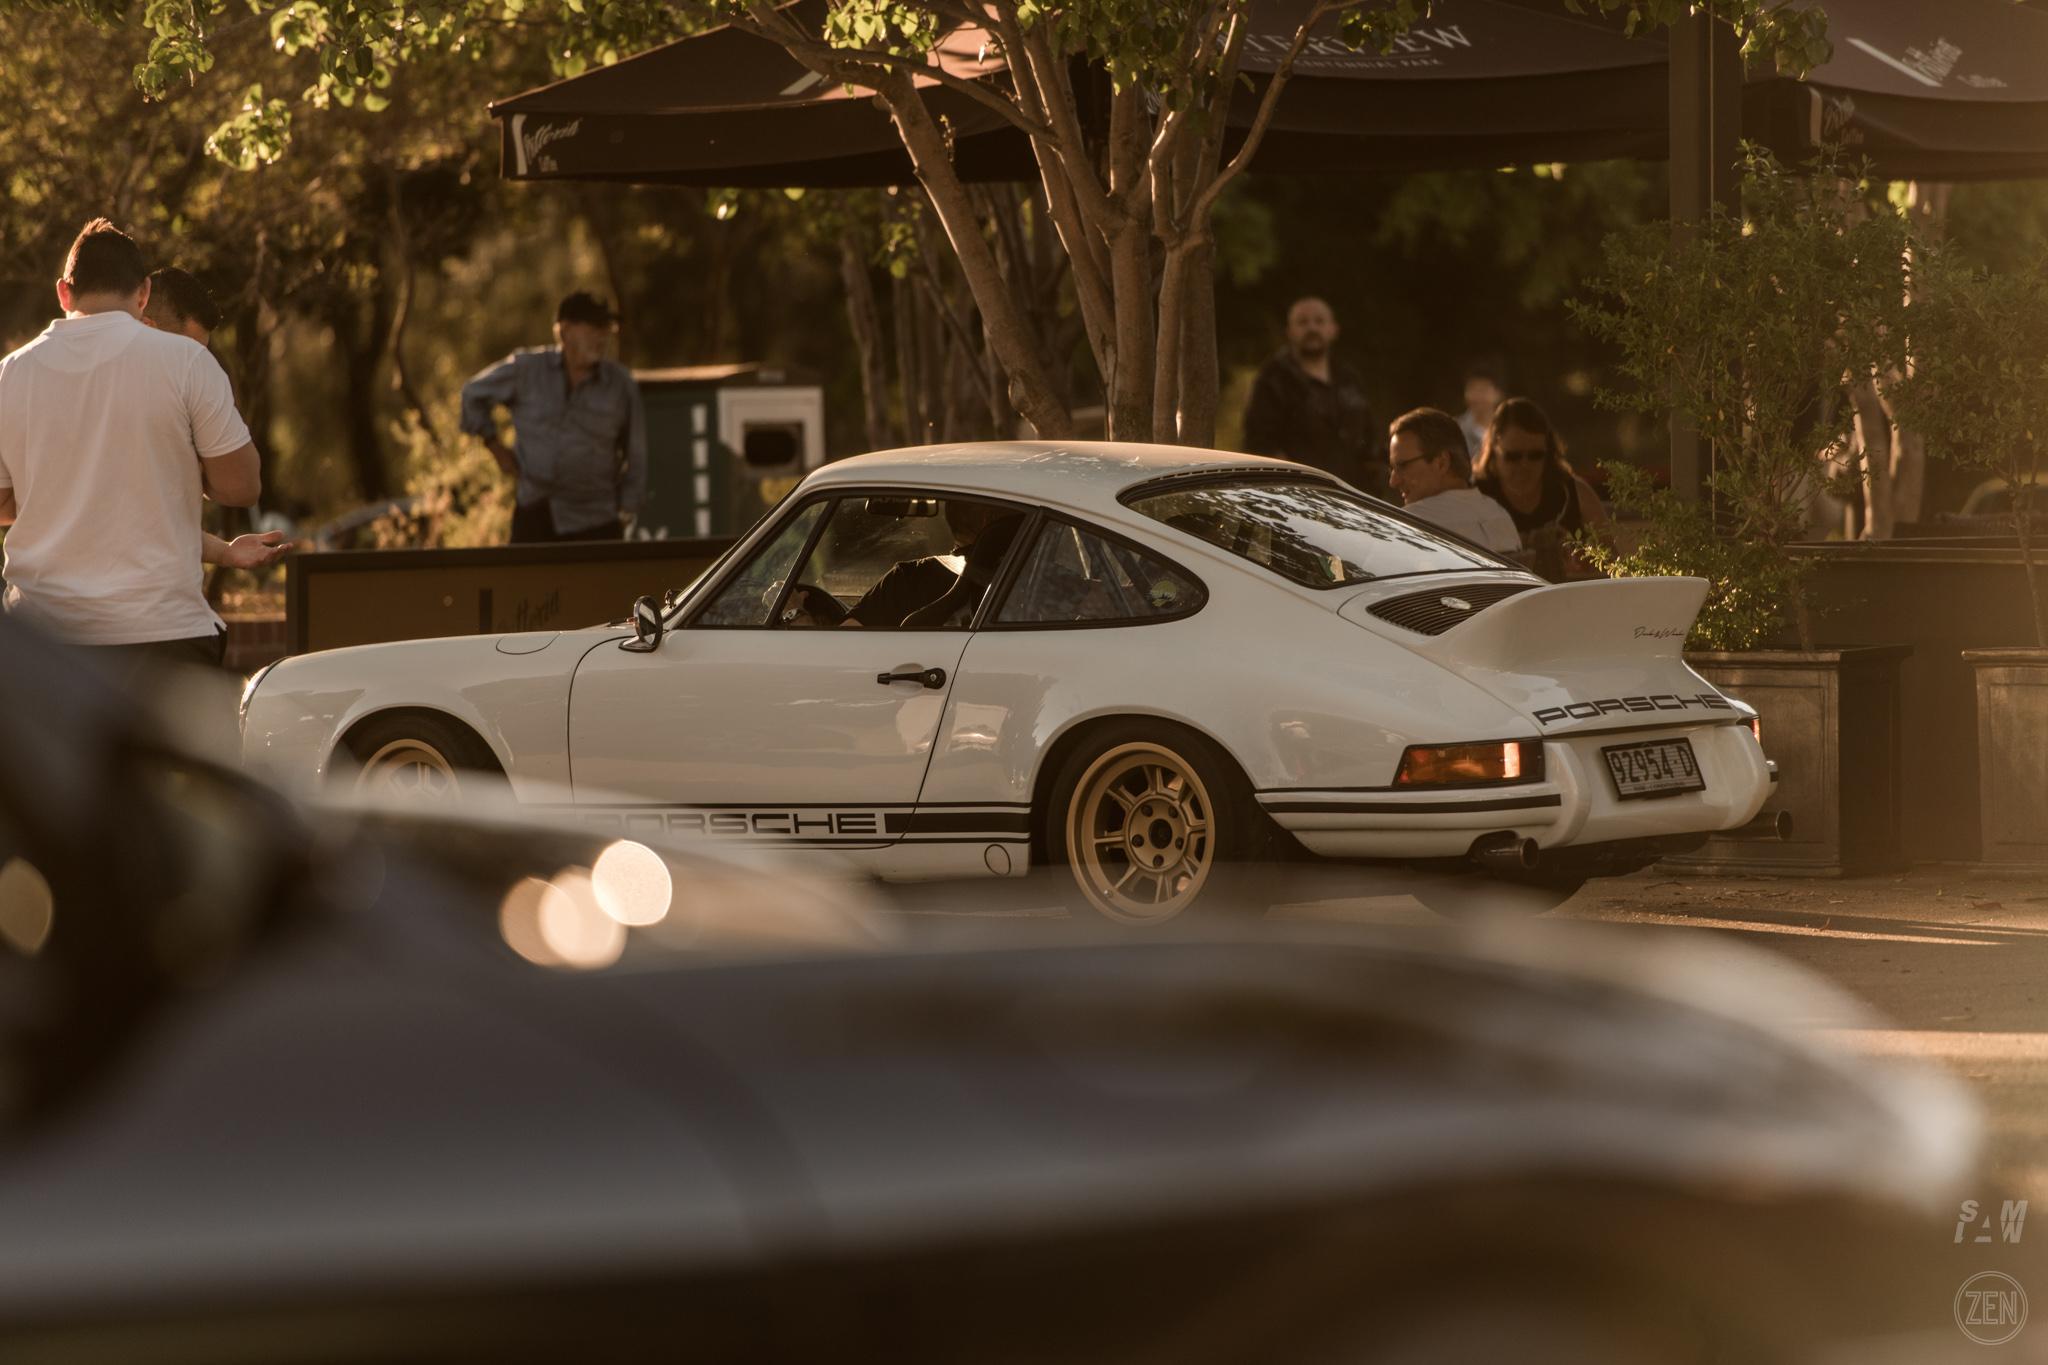 2019-10-27 - Autohaus Porsches & Coffee 053